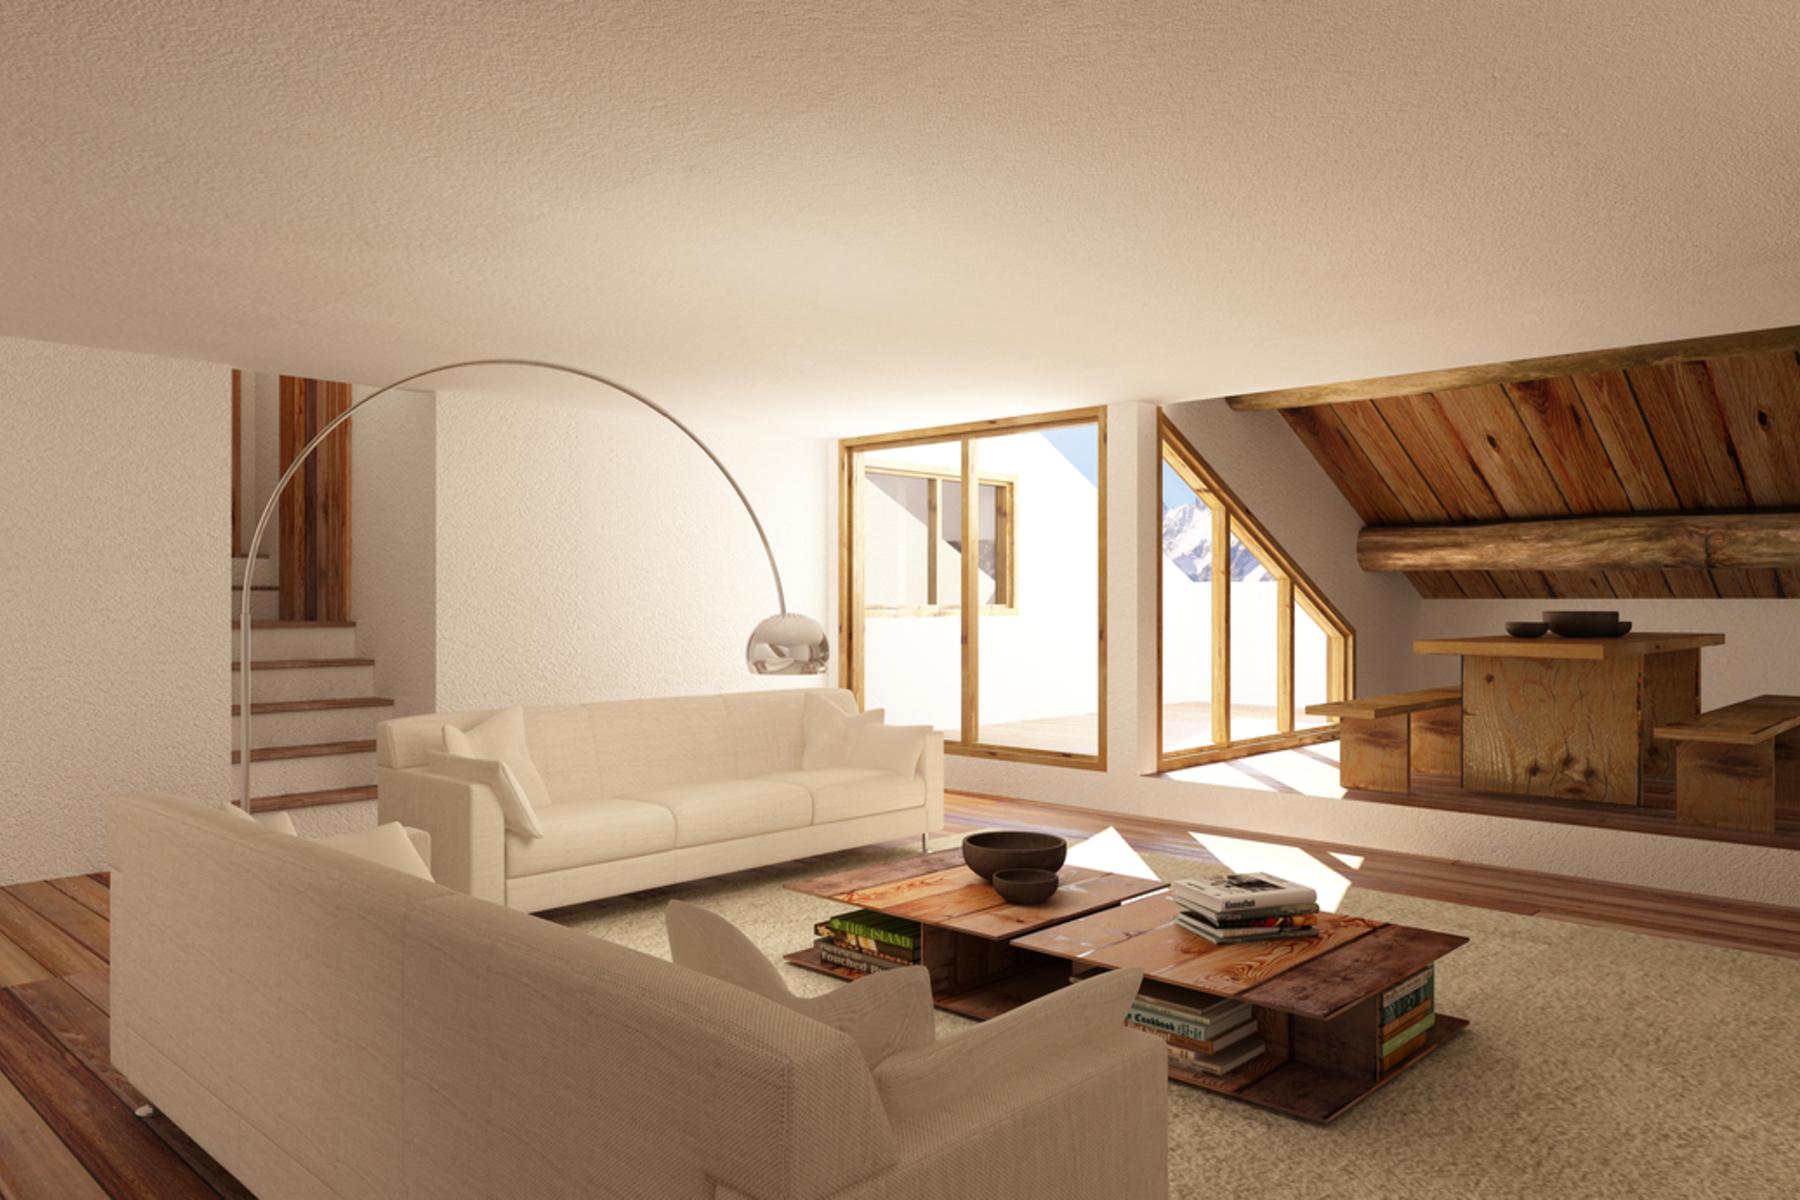 Additional photo for property listing at Spring offer 5.5 room duplex flat in a typical Engadine House La Punt-Chamues-ch Autres Switzerland, Autres Régions De La Suisse 7522 Suisse